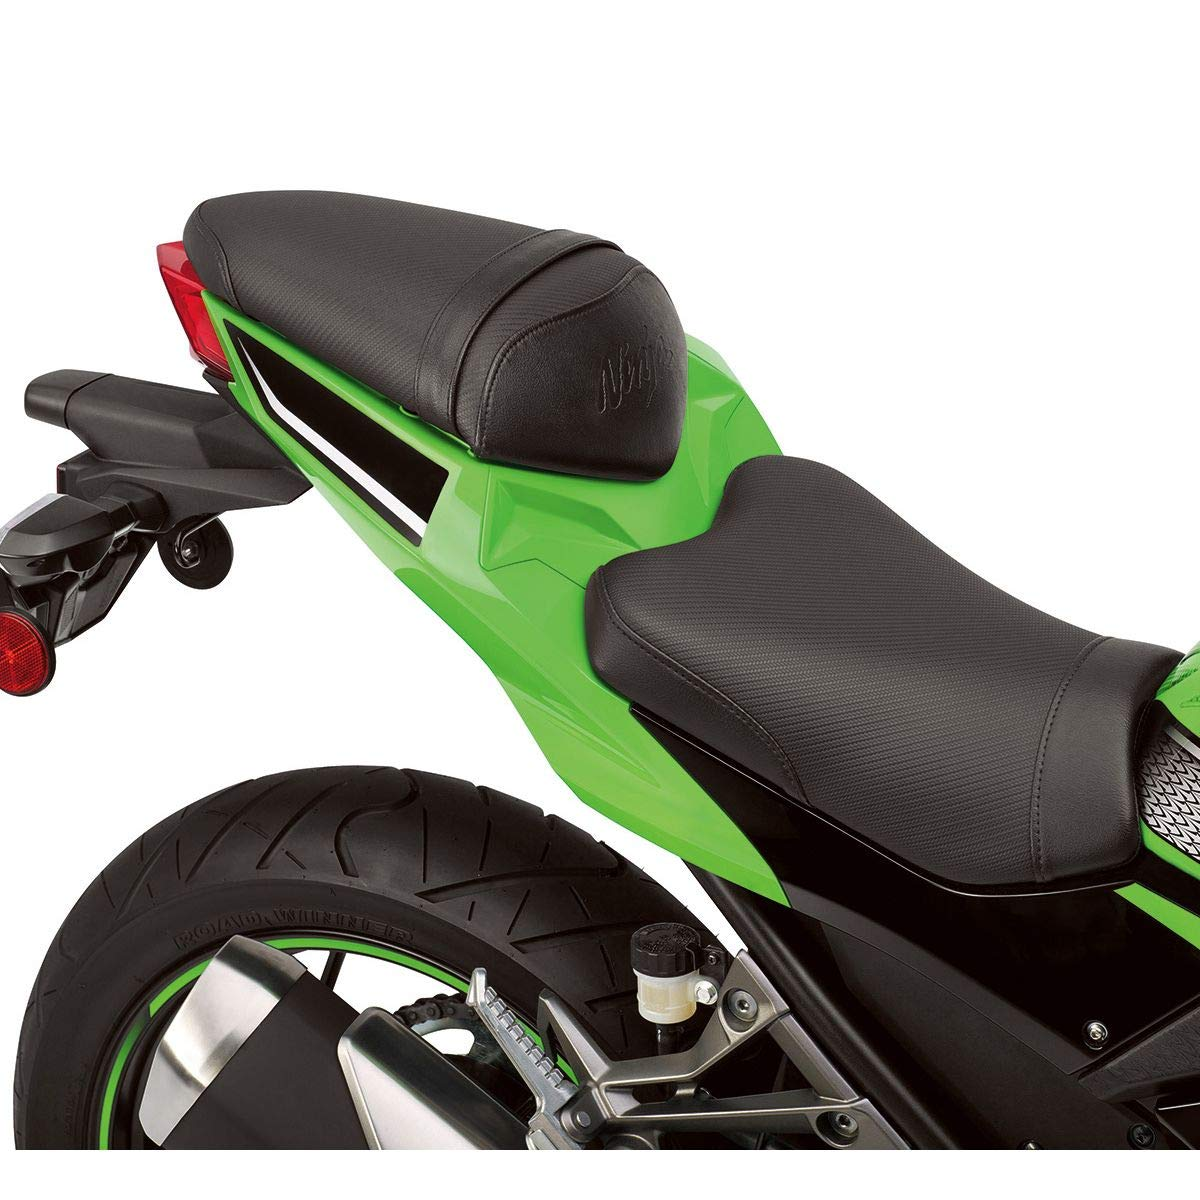 2013 - 2017 Kawasaki Ninja 300 Gel comodidad asiento set ...